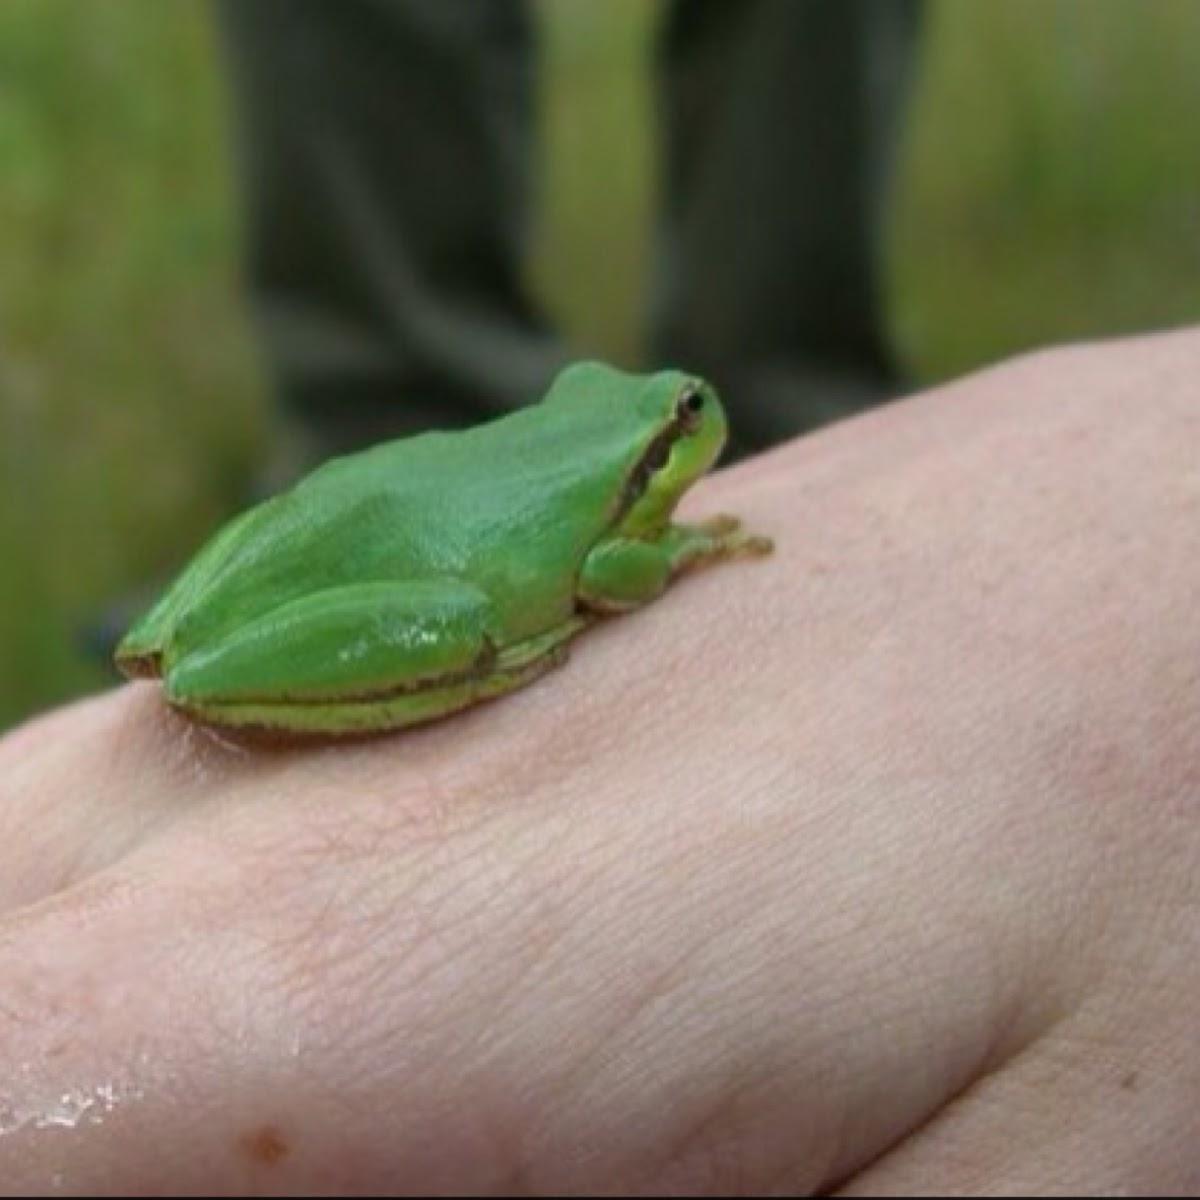 Mediterranean tree frog or stripeless tree frog